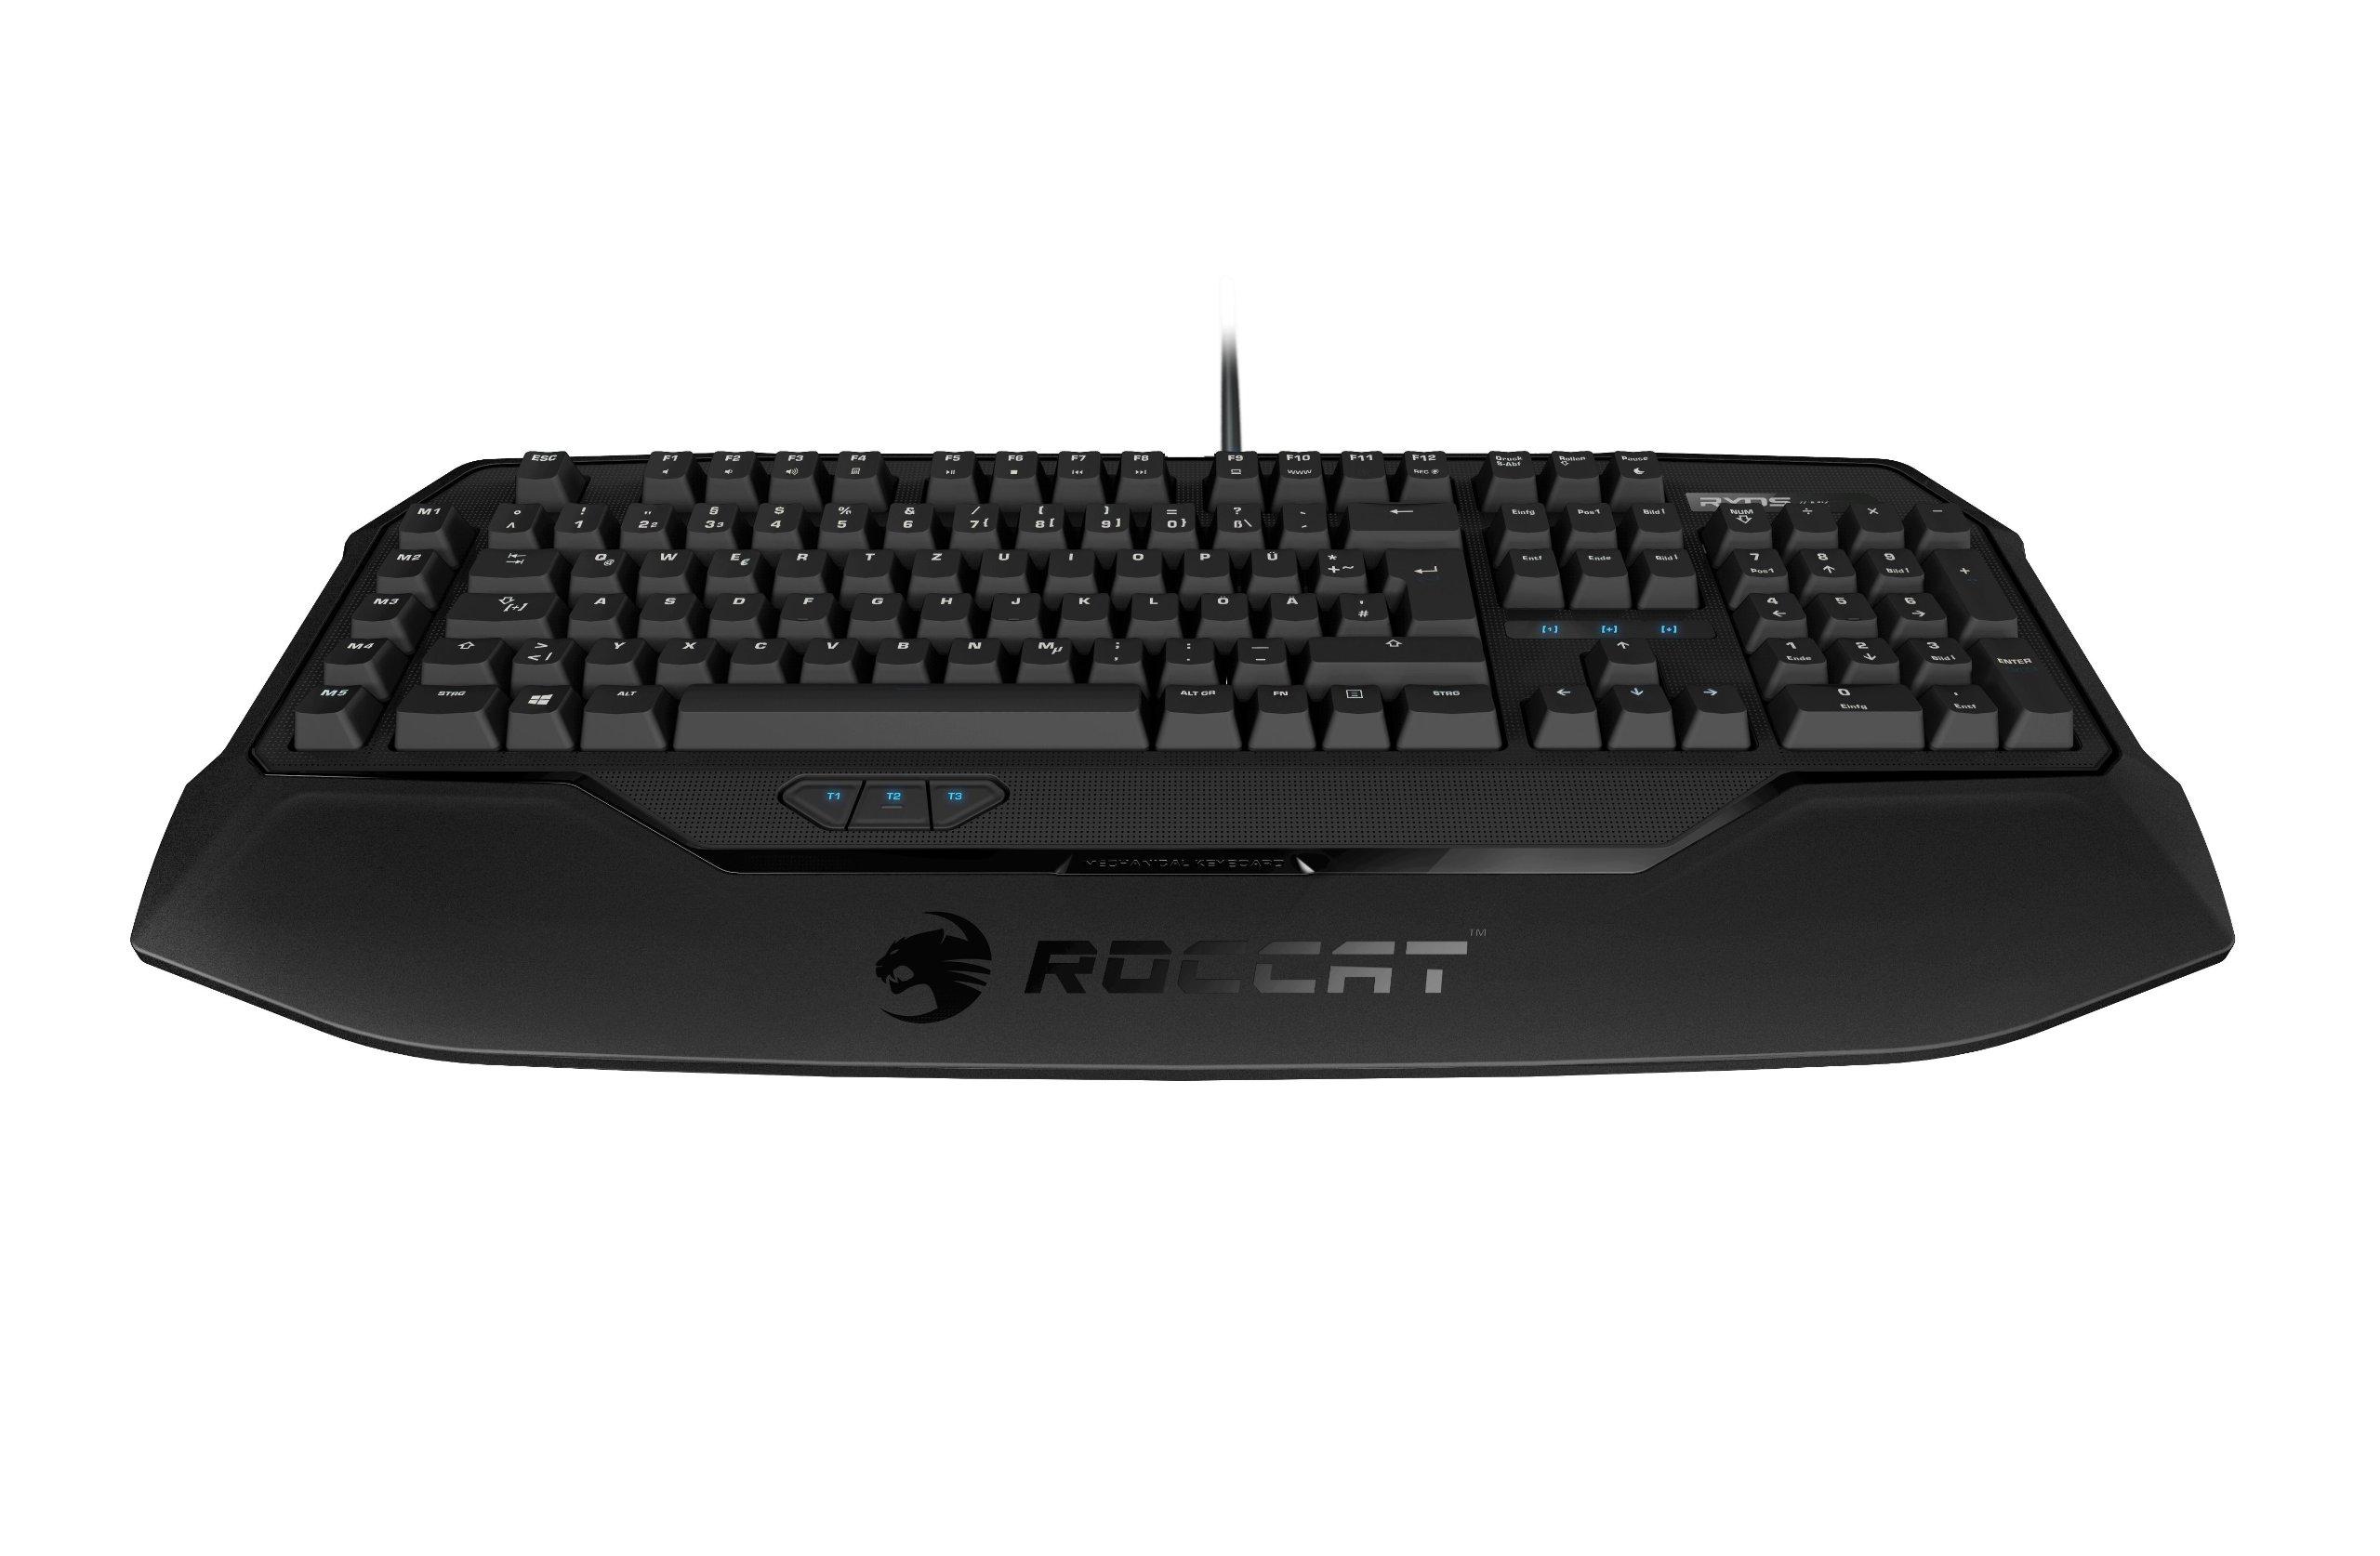 ROCCAT RYOS MK Advanced Mechanical Gaming Keyboard, Black CHERRY MX Key Switch by ROCCAT (Image #3)